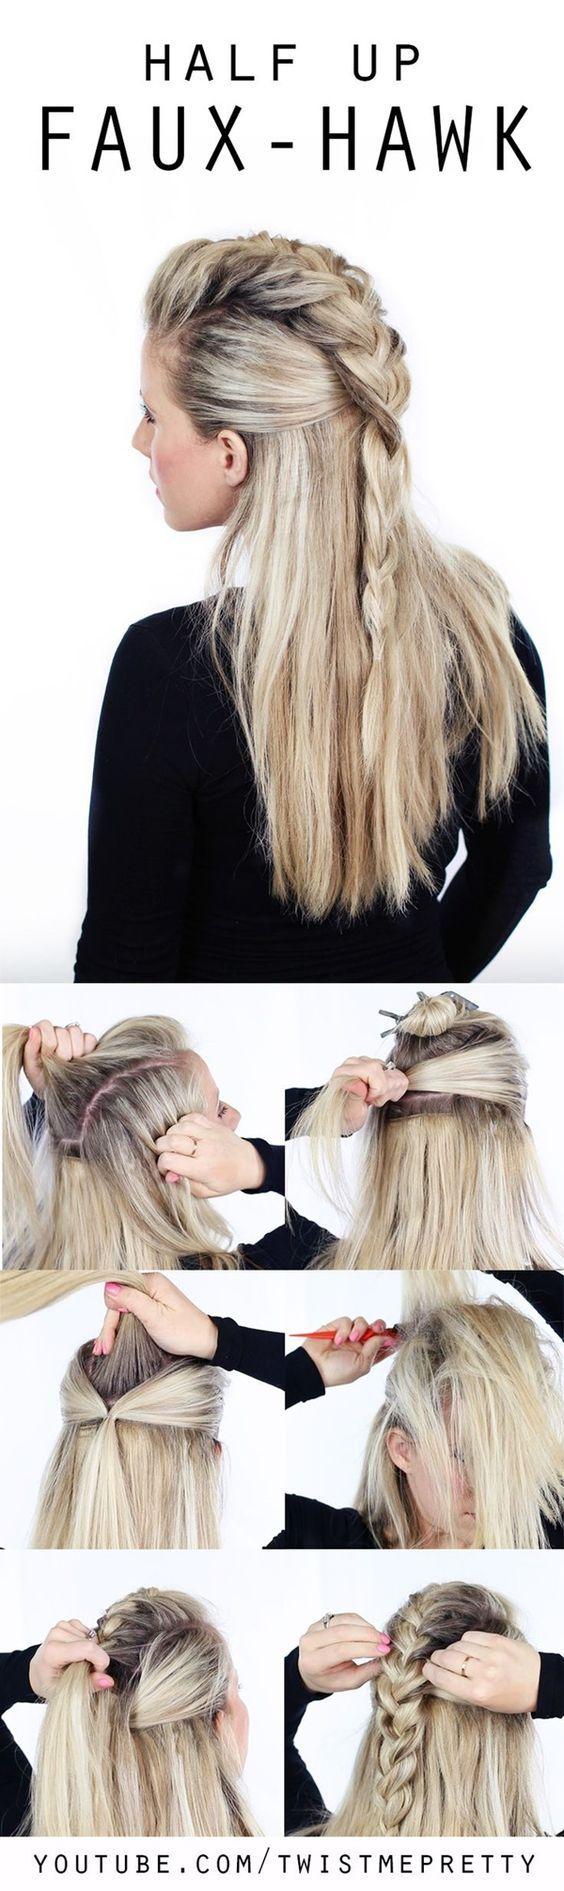 Stupendous 1000 Ideas About Everyday Hairstyles On Pinterest Evening Short Hairstyles Gunalazisus